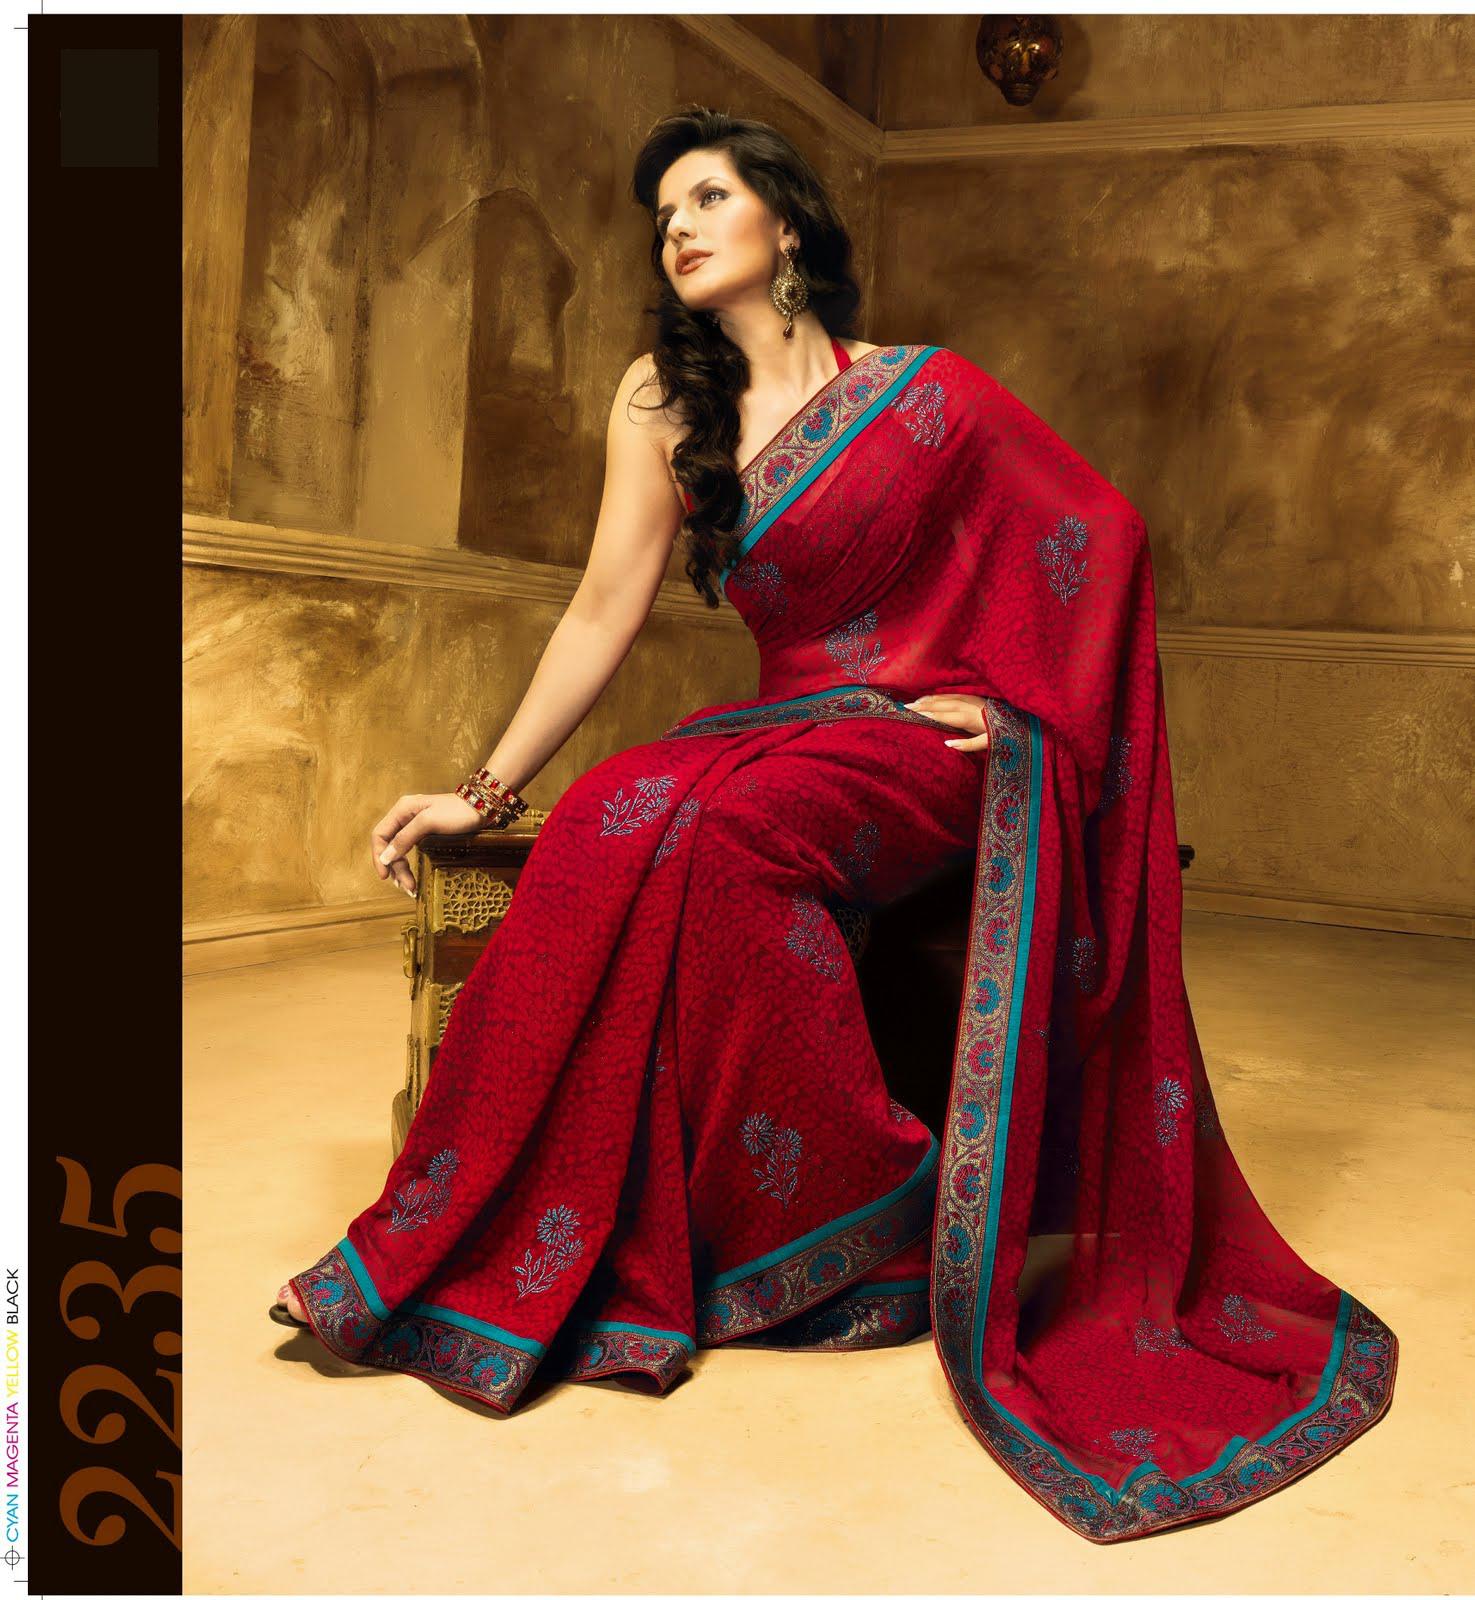 Hot Zarine Khan Showing Hot Figure In Traditional Dress